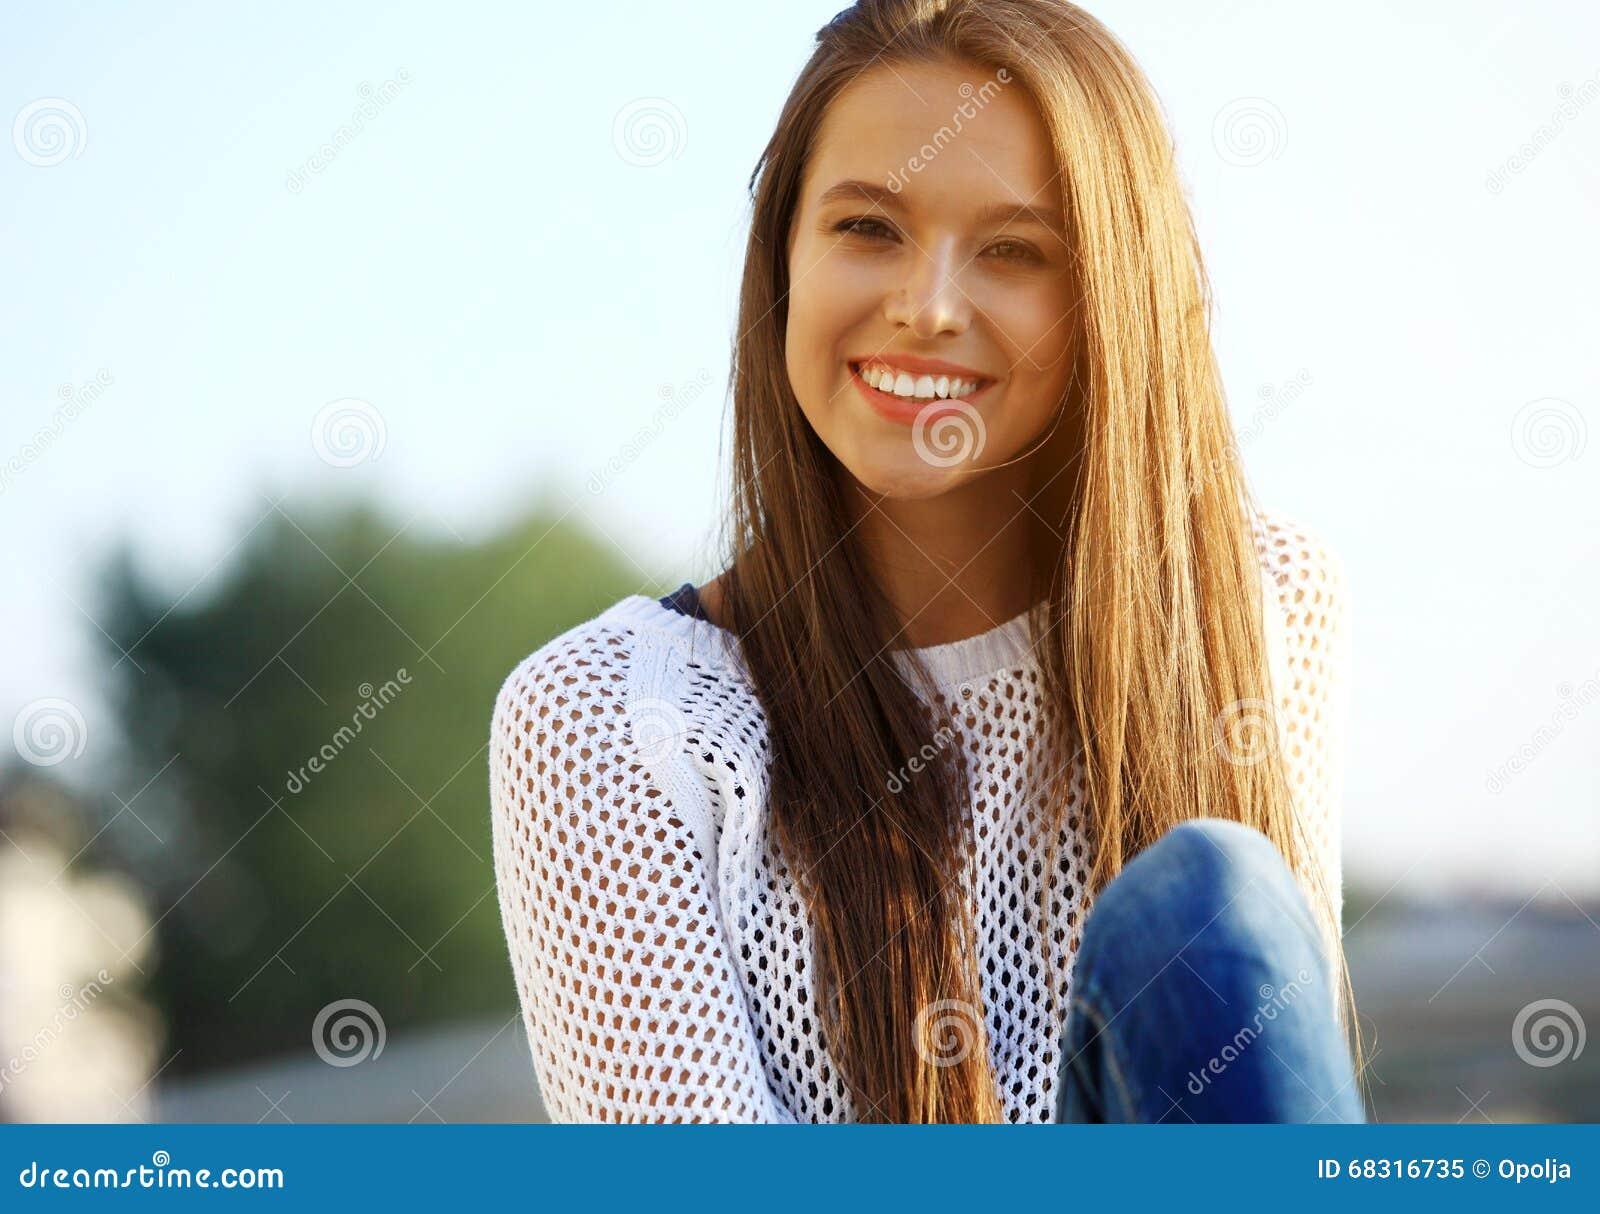 Portret van jonge glimlachende mooie vrouw Close-upportret van het verse en mooie jonge mannequin openlucht stellen